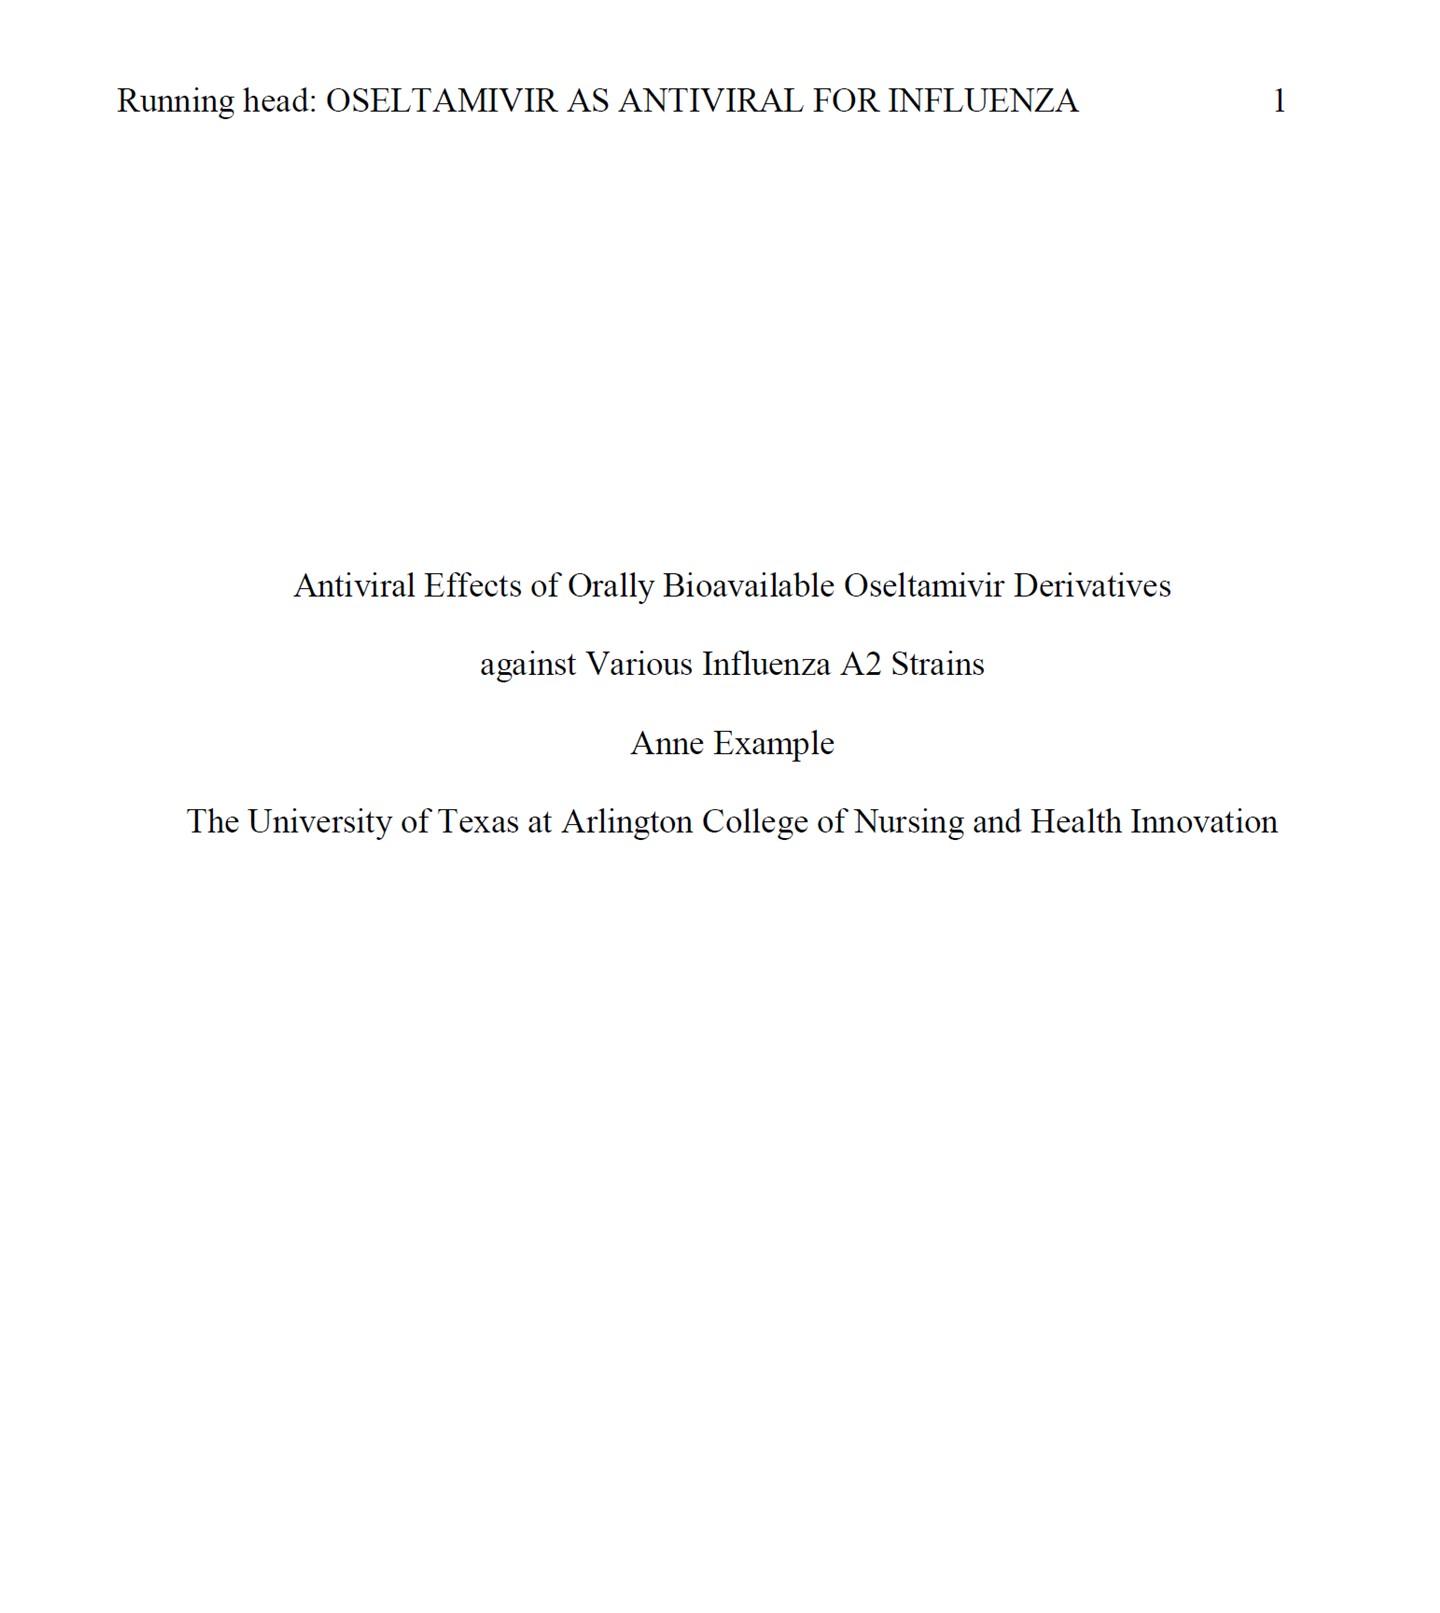 002 Presentation1 Essay Example Cover Page Impressive Apa Correct Title Proper Format Full